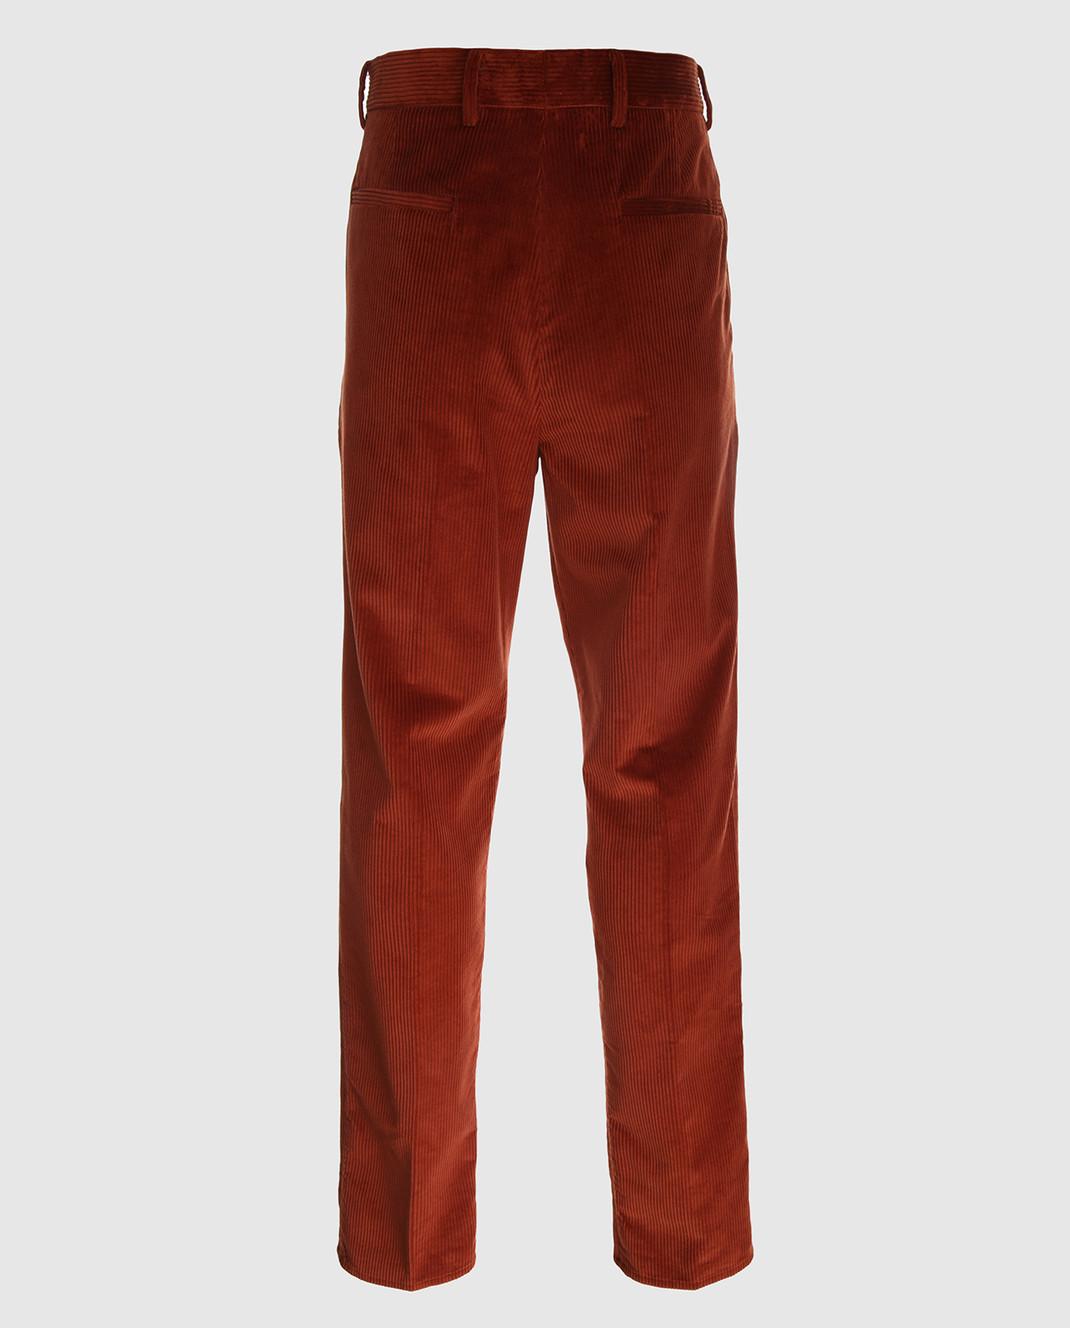 Brunello Cucinelli Терракотовые брюки ME233S2100 изображение 2